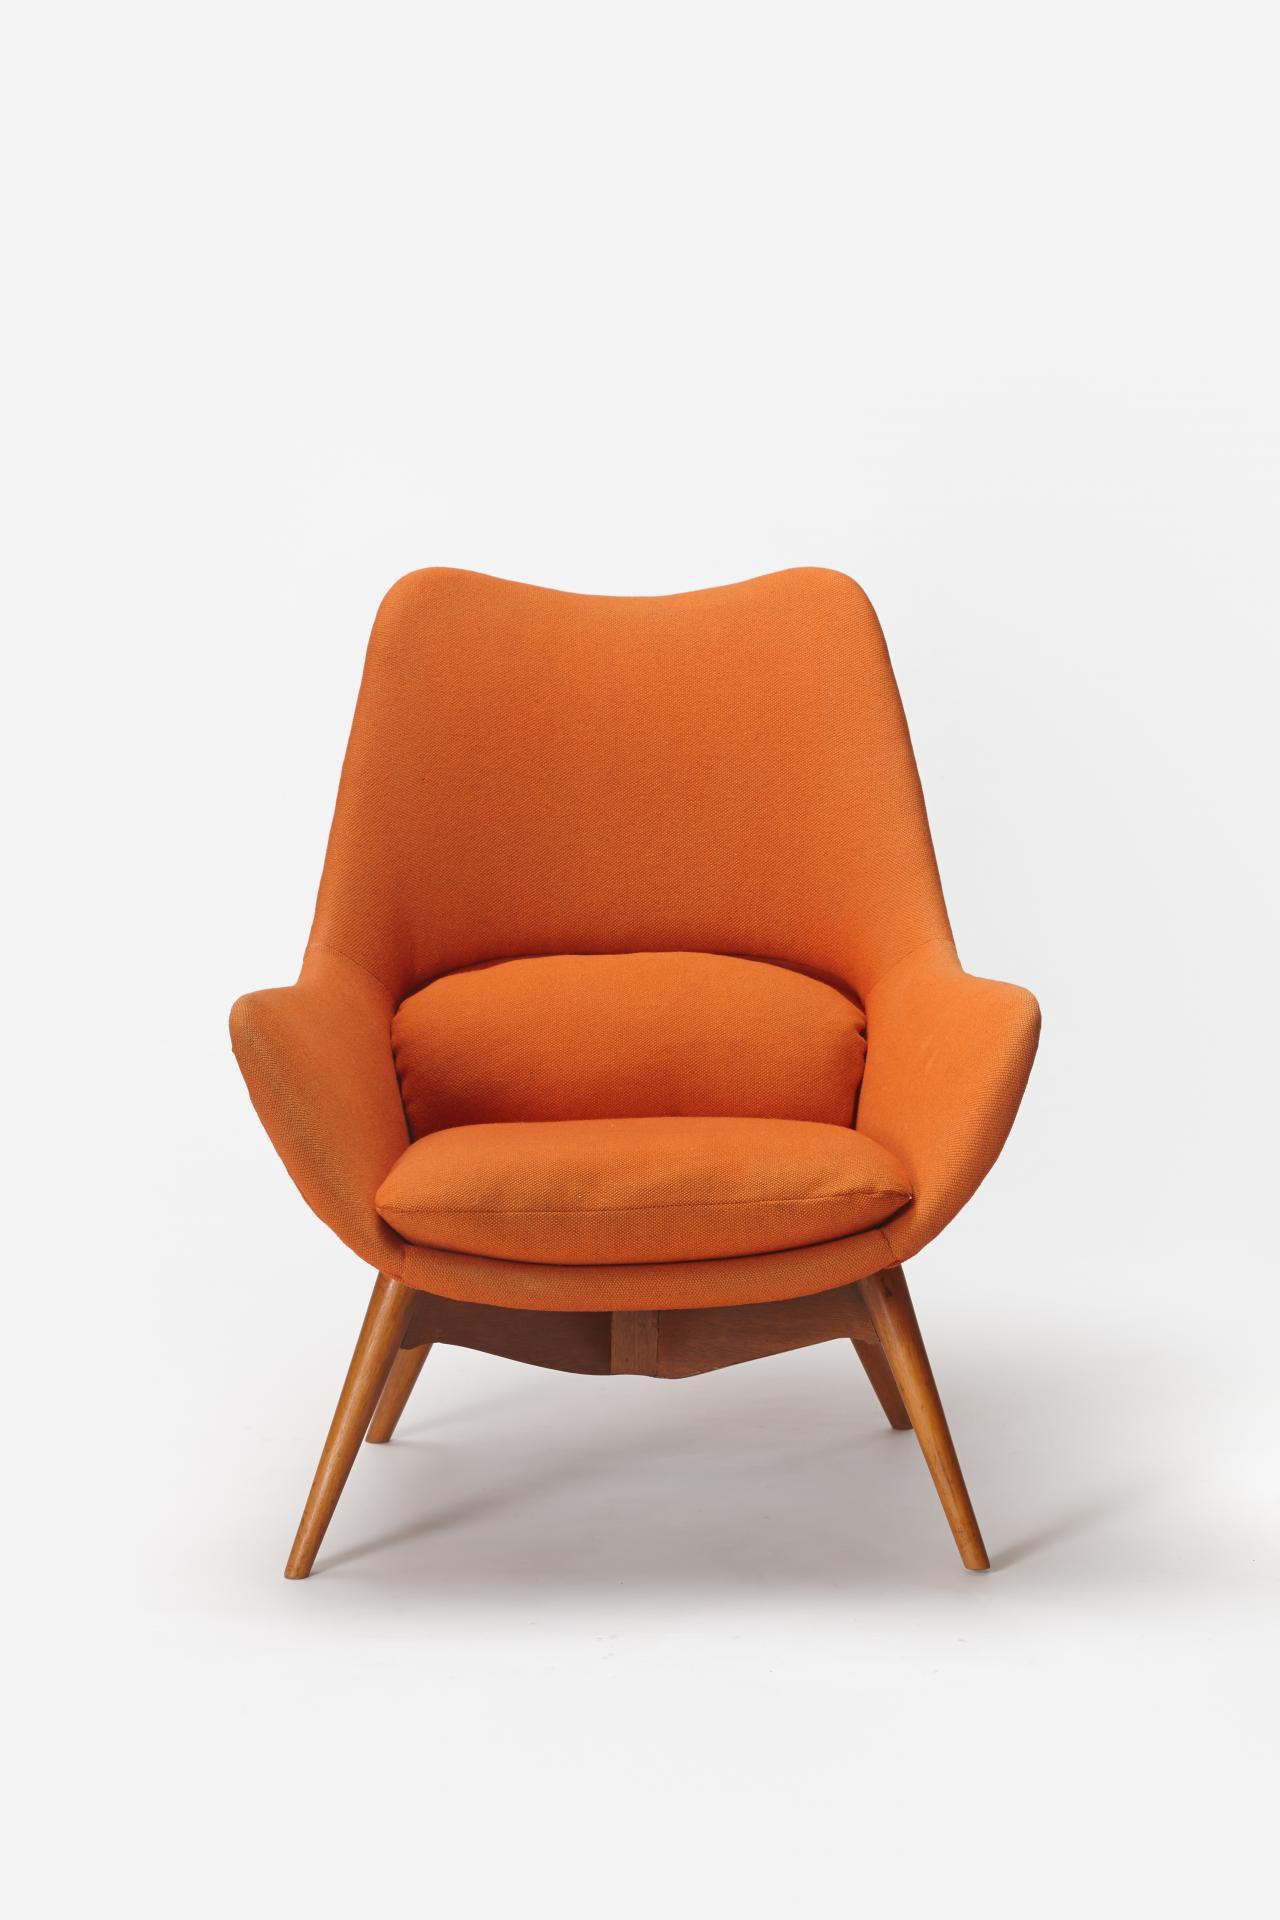 Key Works  Mid Century Modern NGV. Famous Australian Furniture Designers   12Play4Fun com